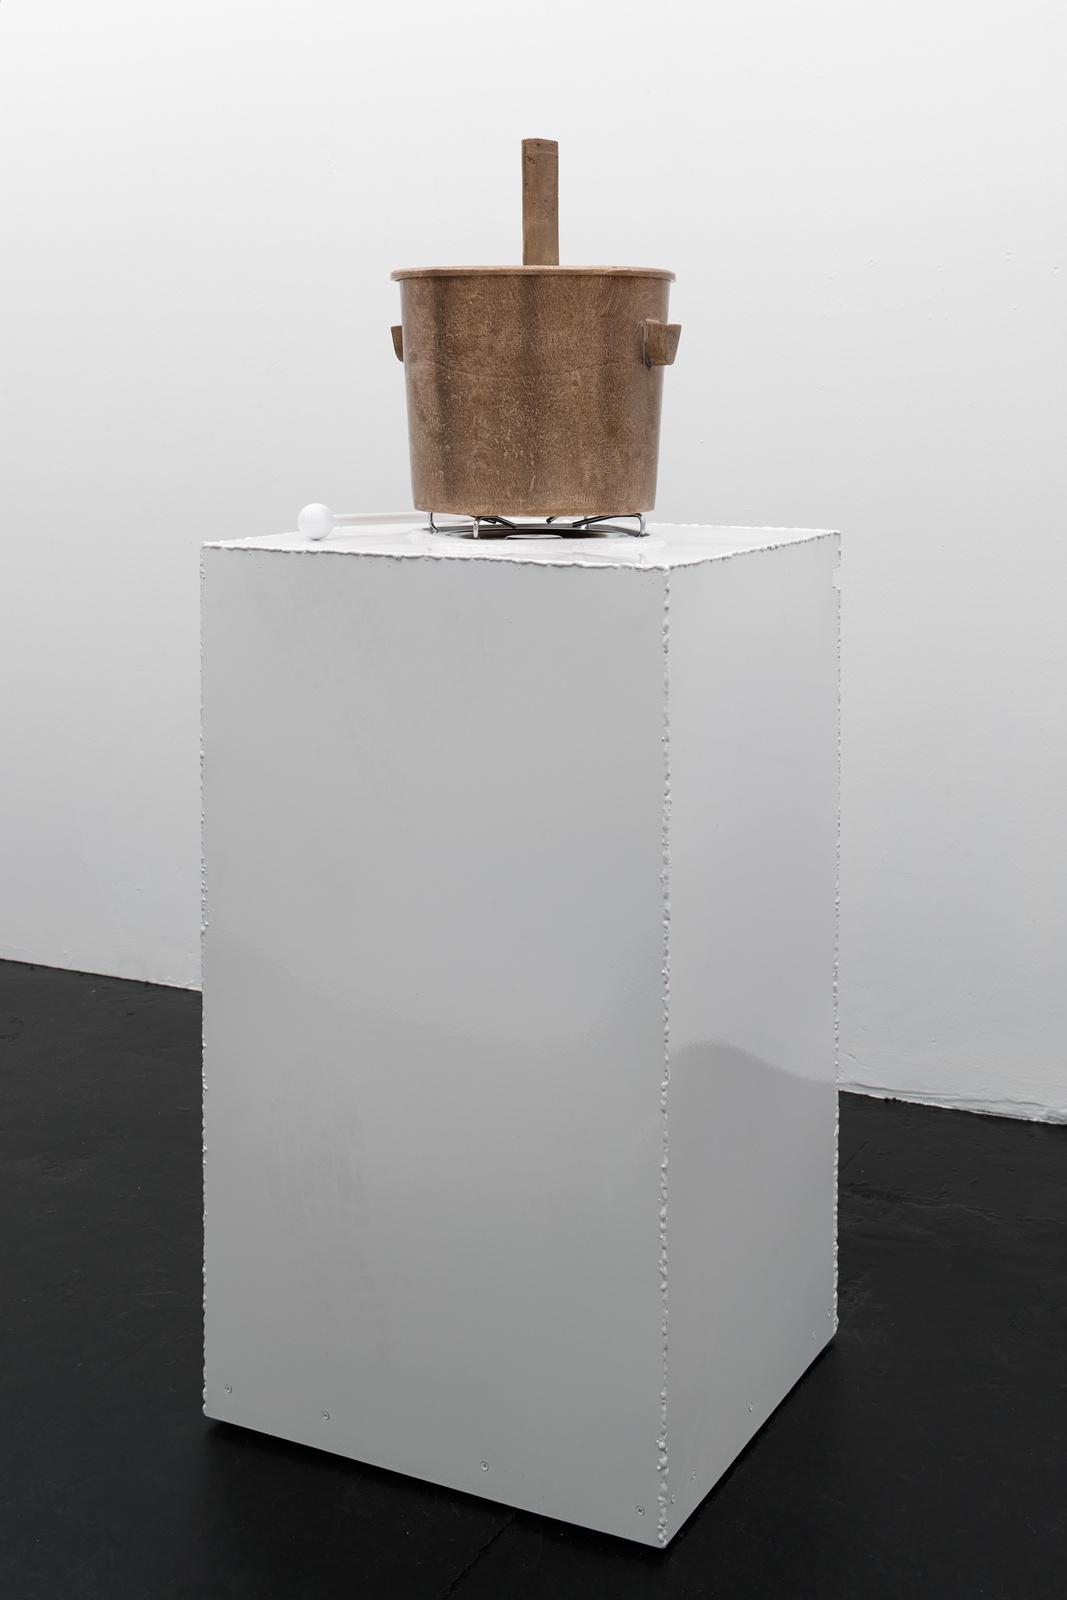 Franz West - Caldare ( A mobile stove sculpture object), 1991